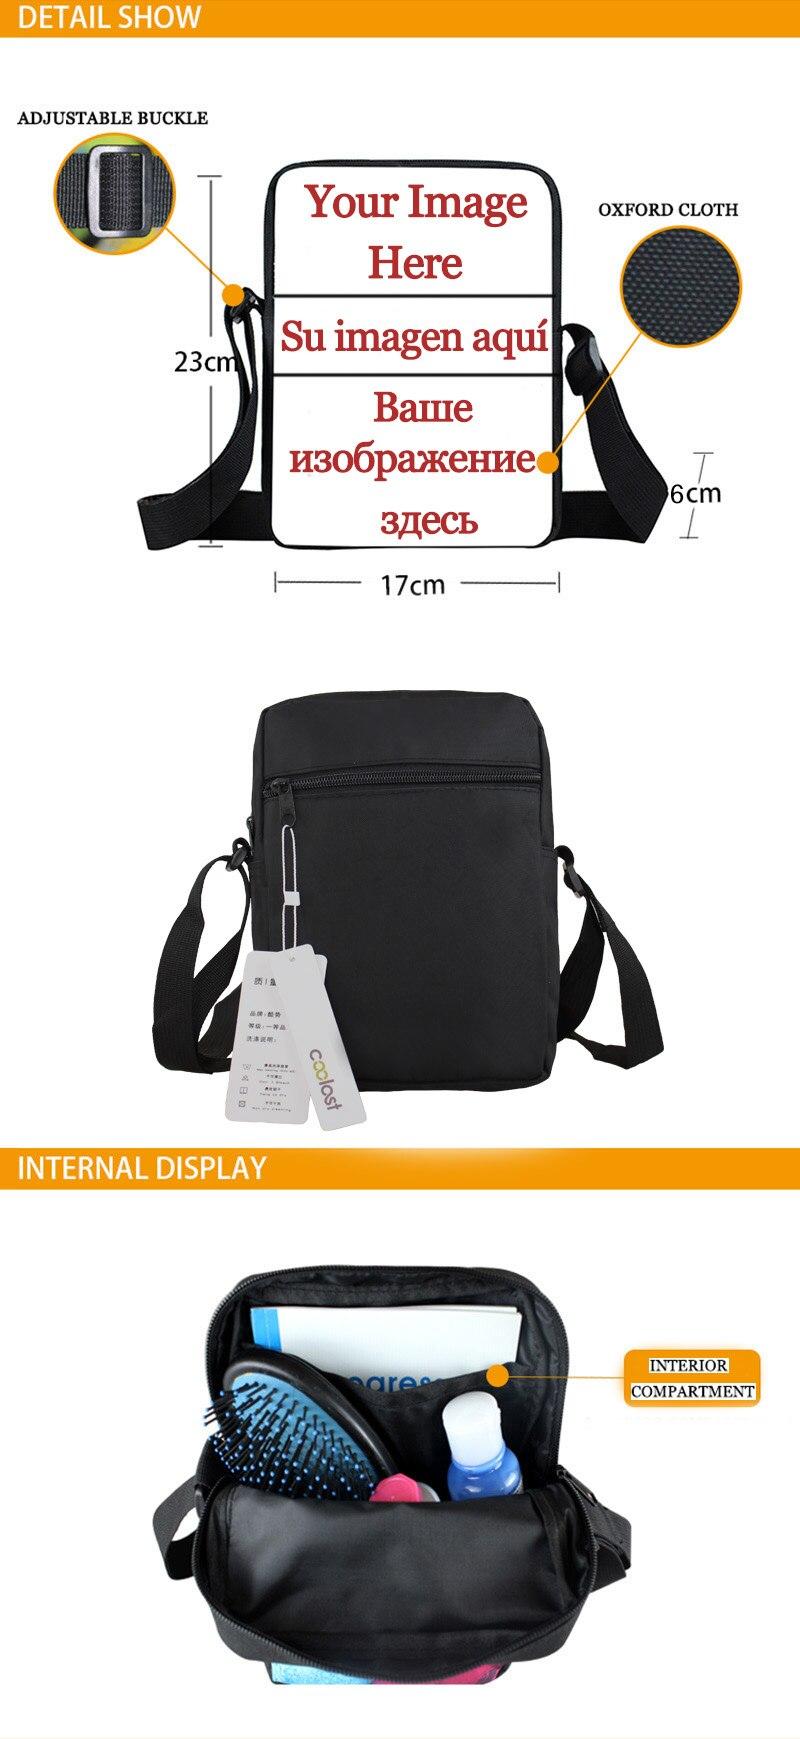 e0ddc47052cb Anime Danganronpa Mini Messenger Bag Boy Girls Dangan Ronpa Children  Shoulder Bags Monokuma Crossbody Bag Kid Student Book Bags